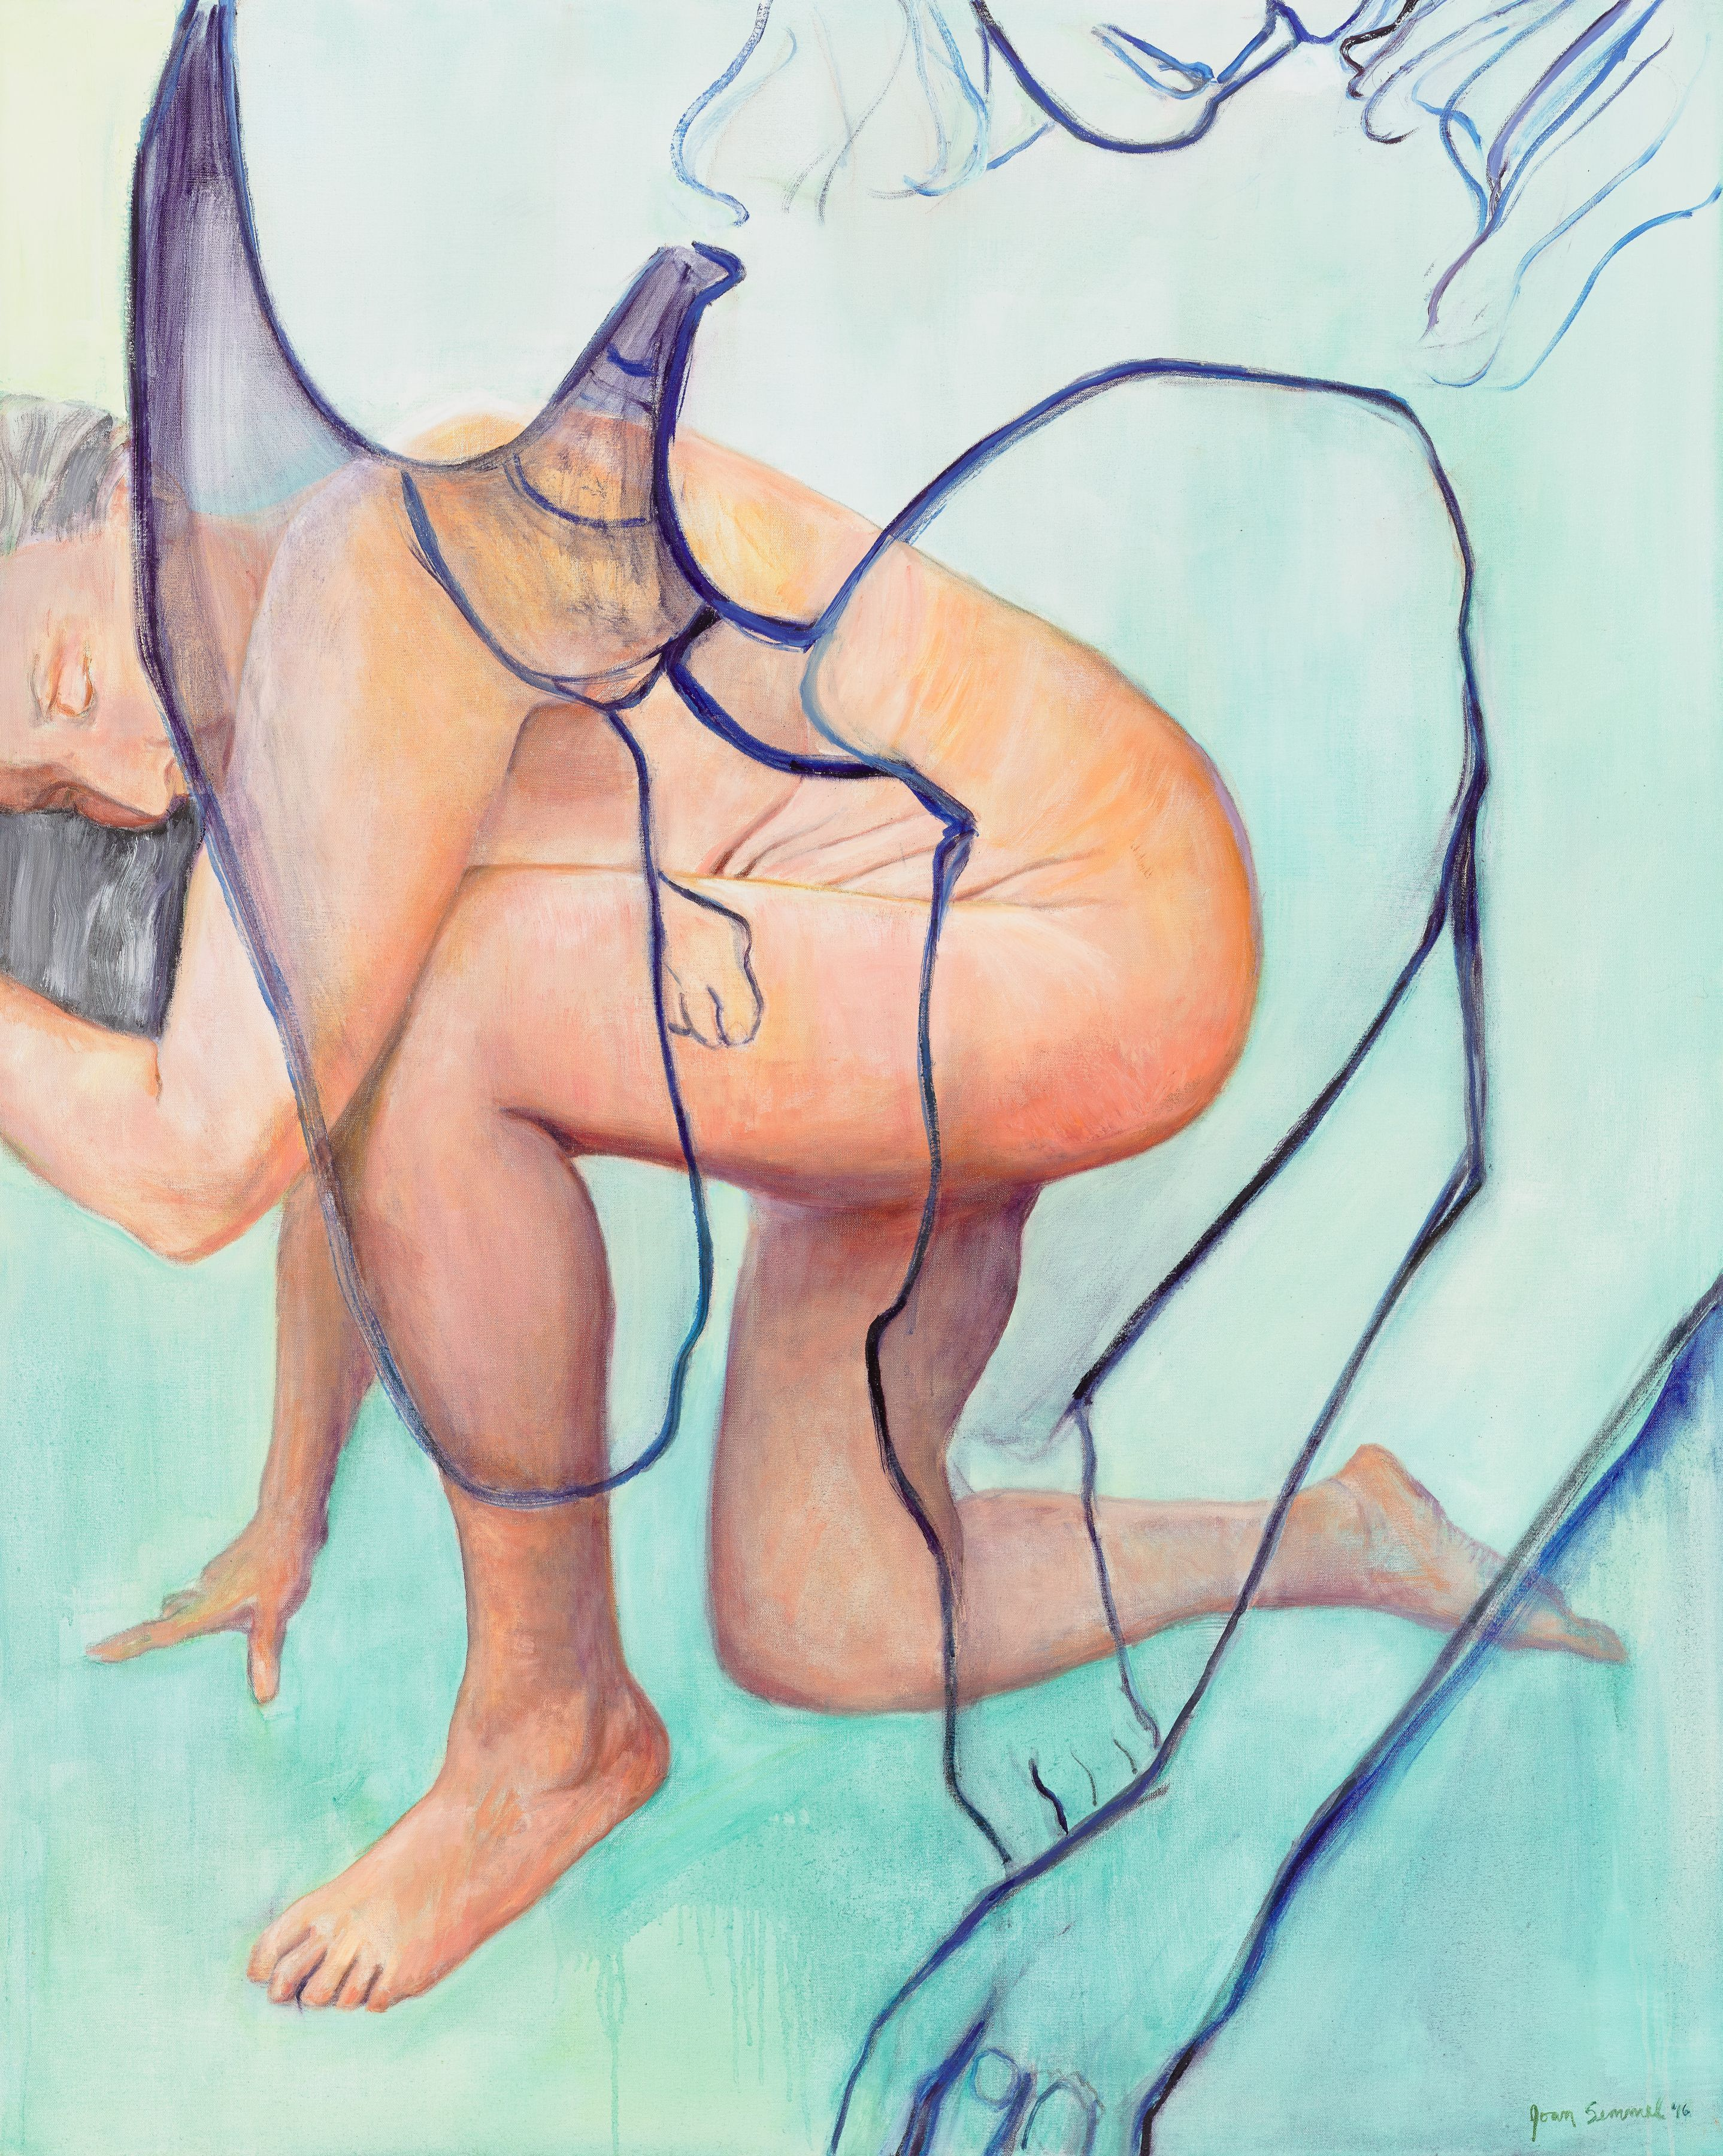 Joan Semmel, Step Out, 2016